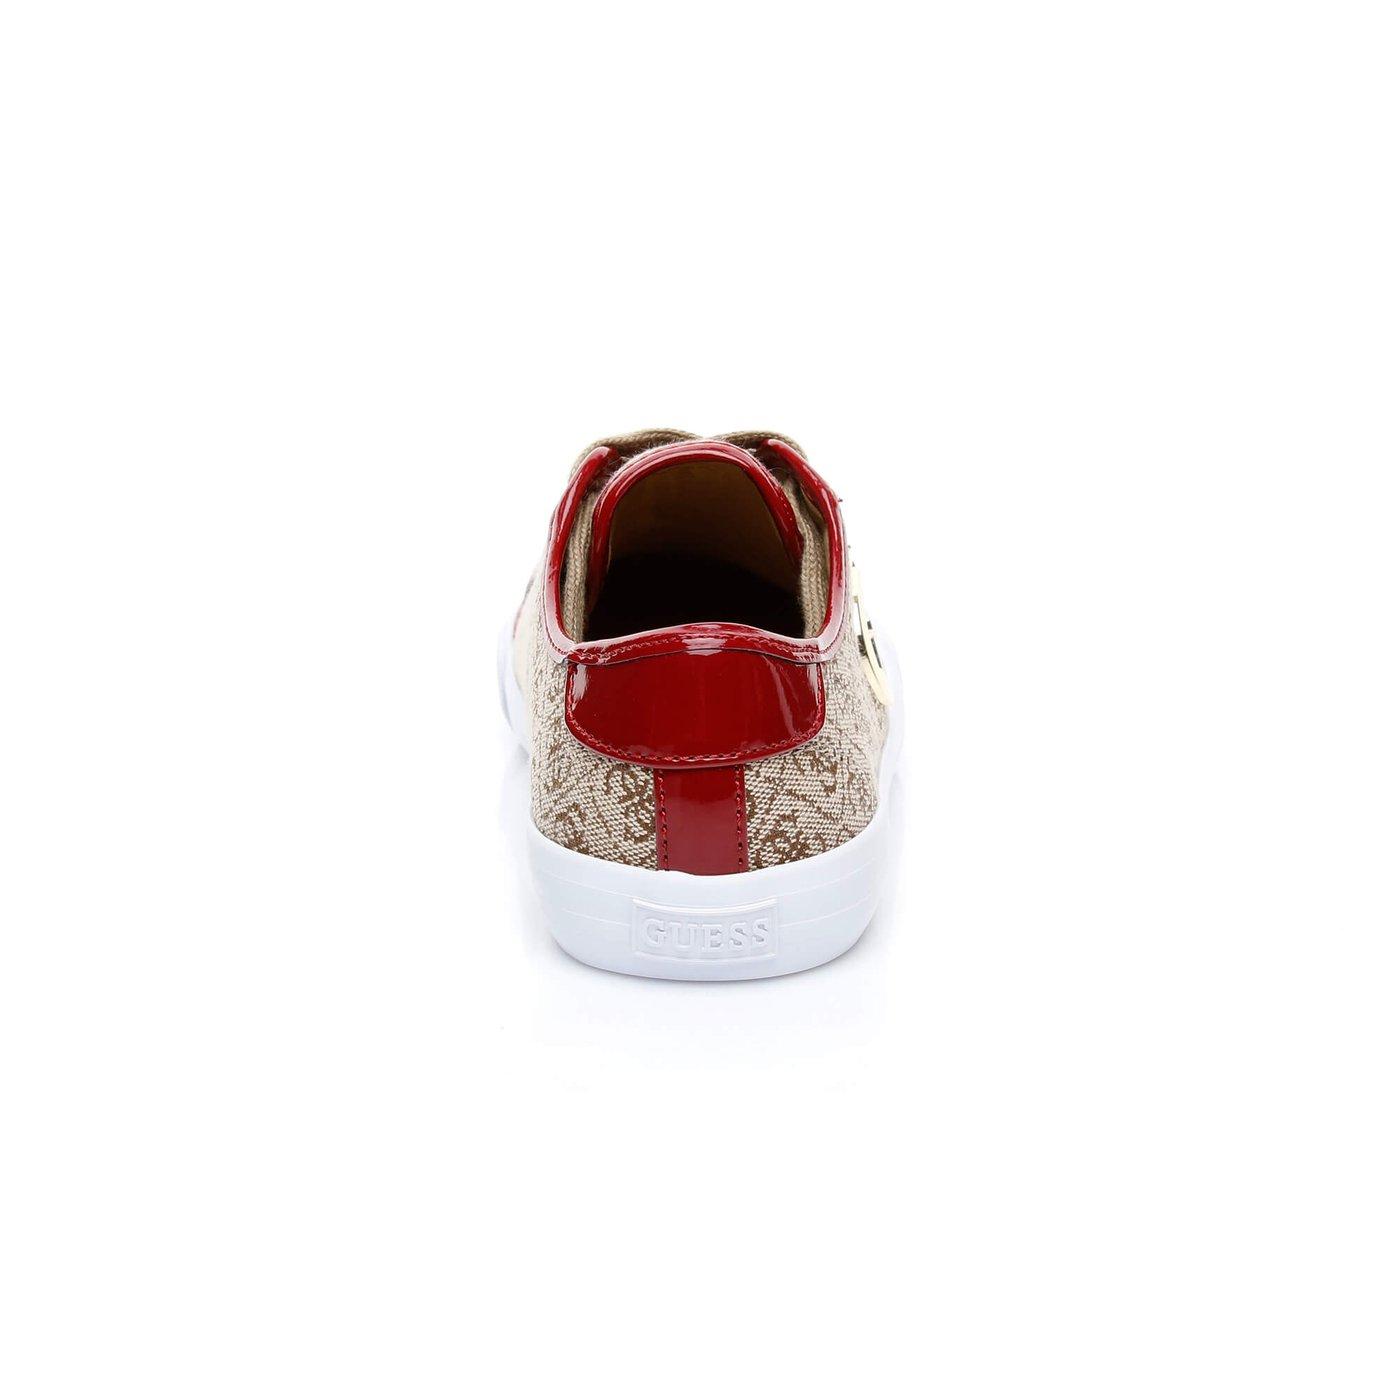 Guess Elly Kadın Kahverengi Sneakers